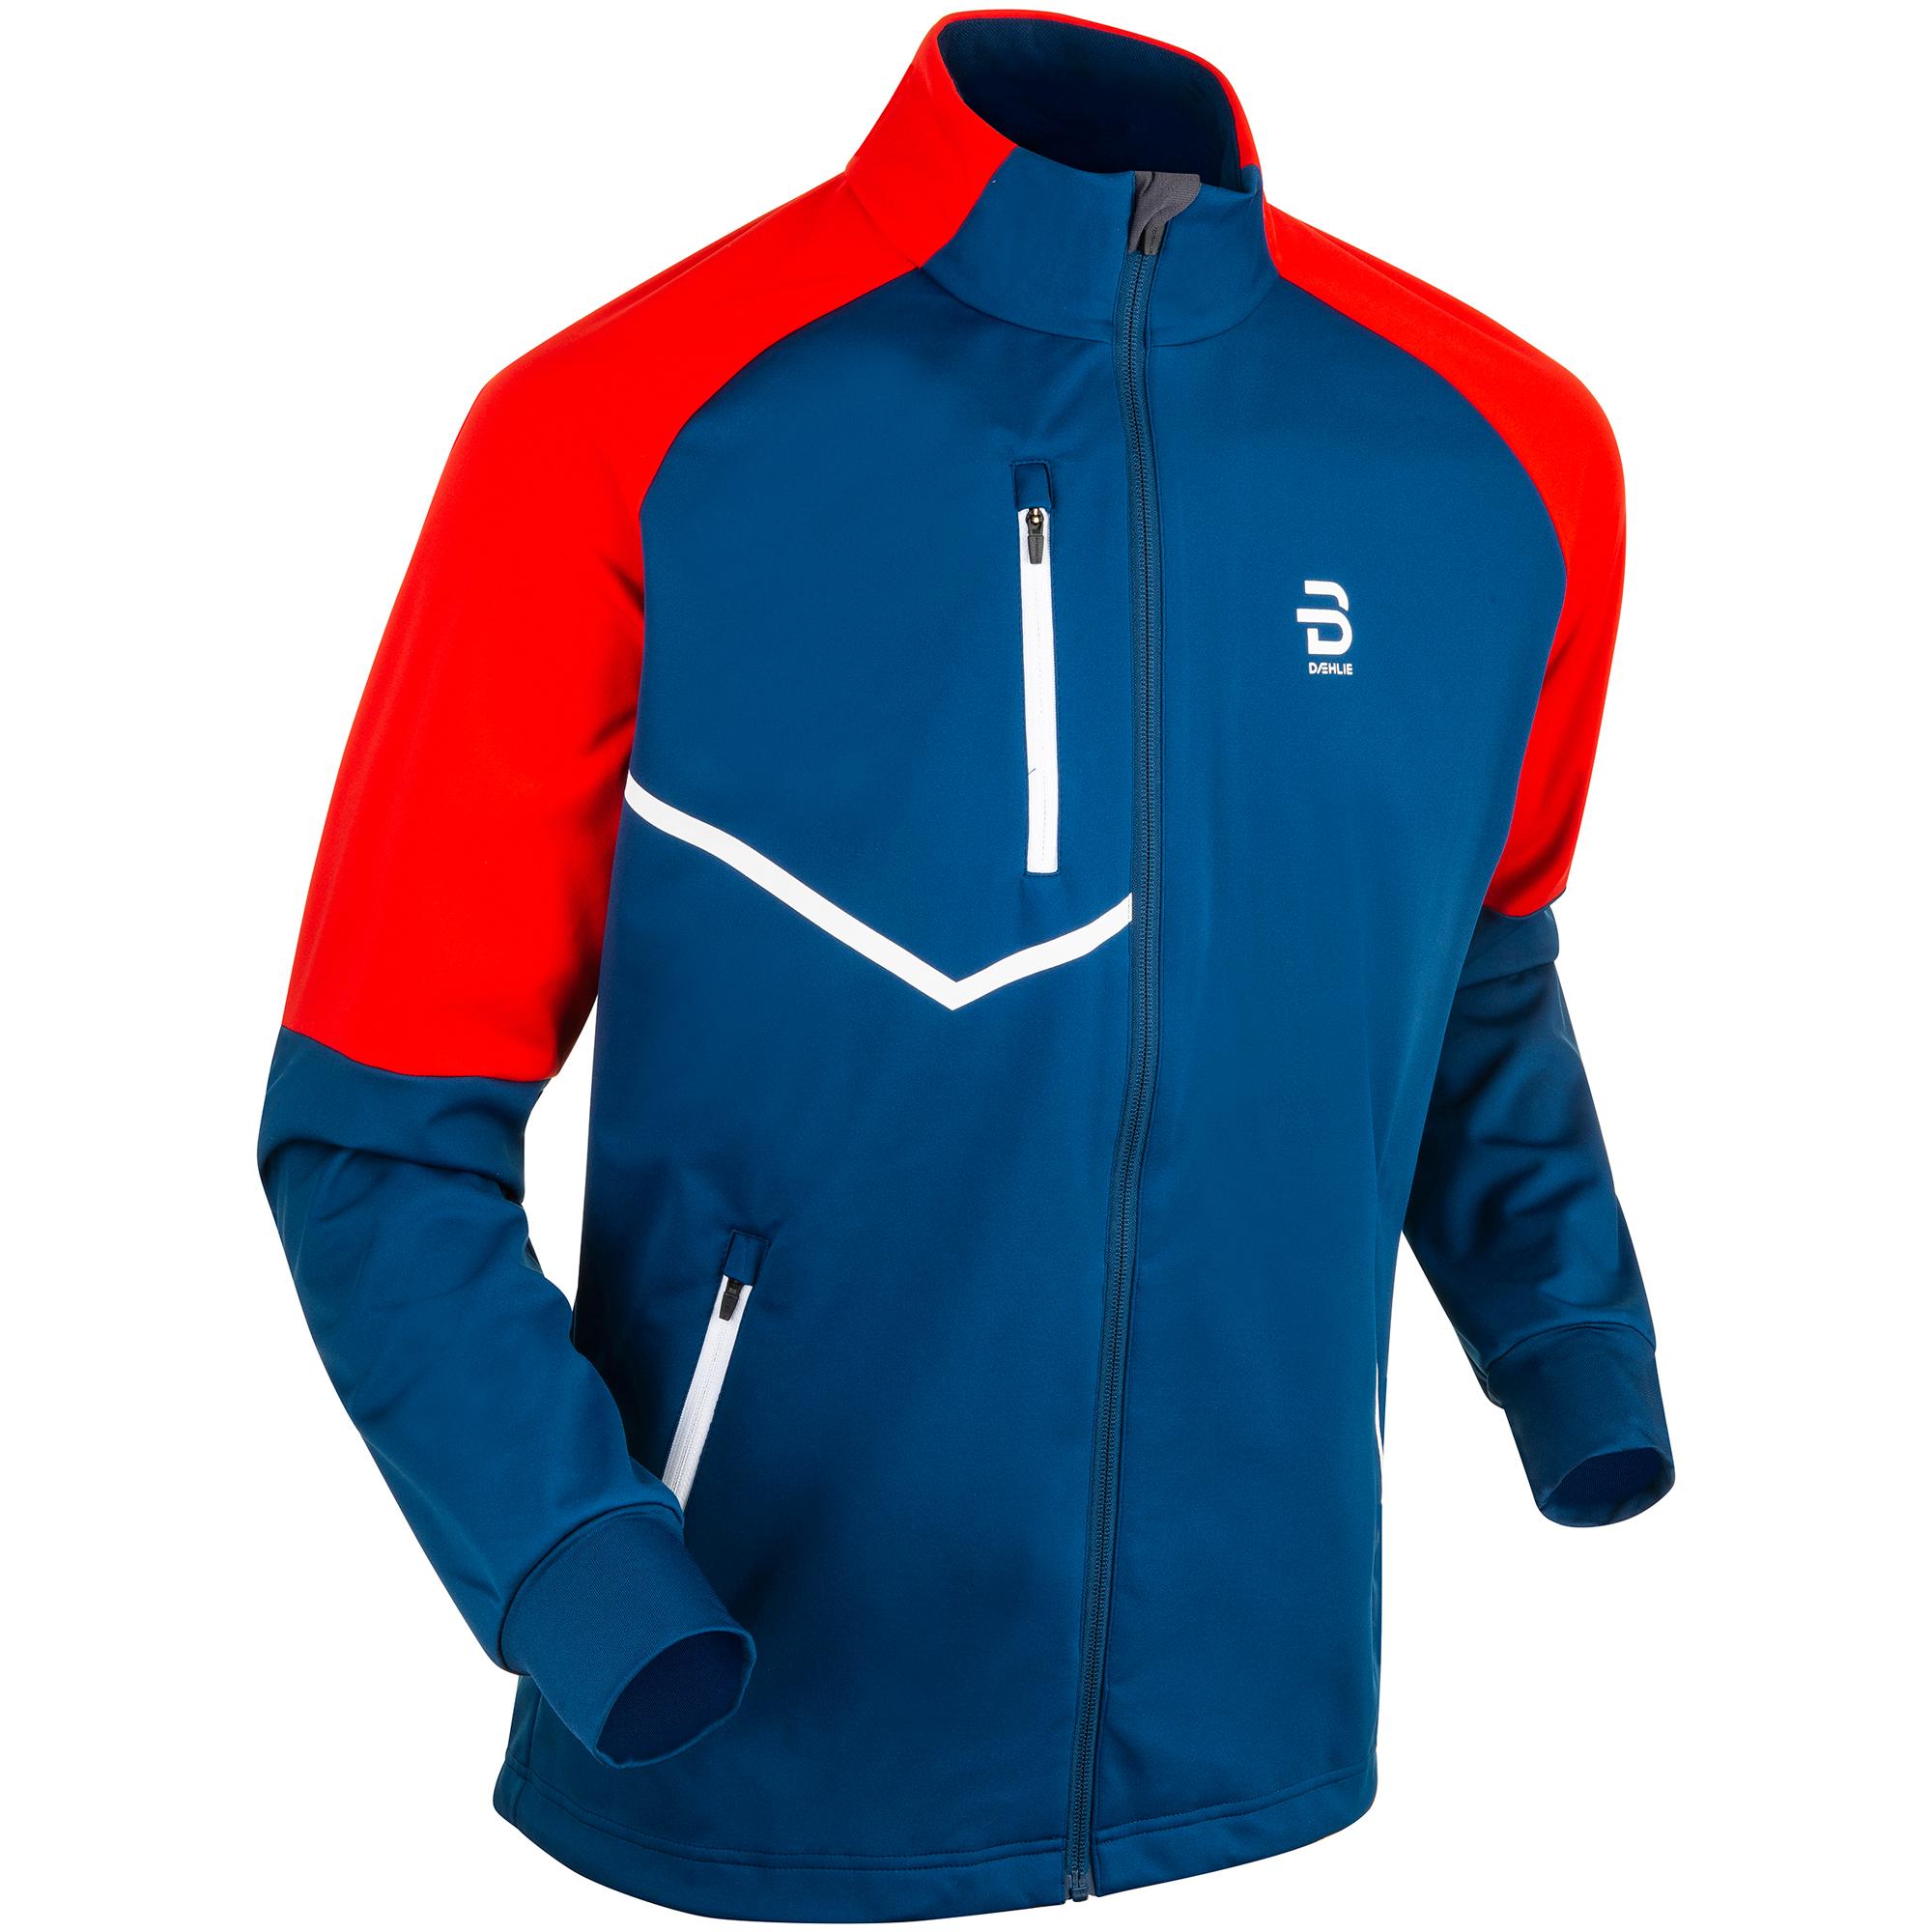 Veste Bjorn Daehlie Jacket Kikut Bleu Rouge